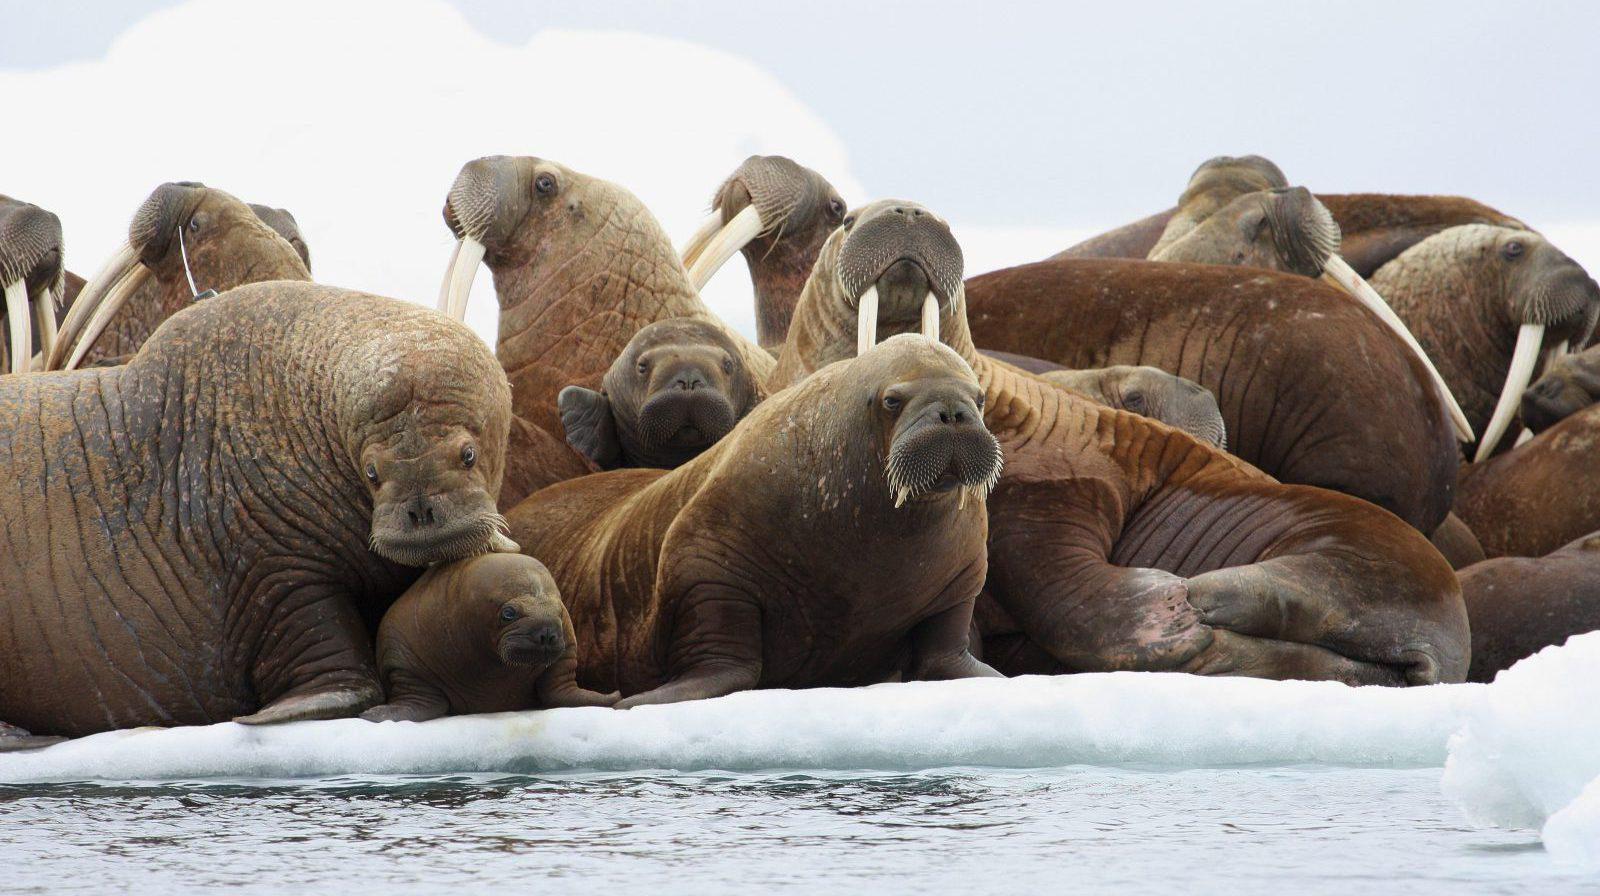 Seals in the Arctic.